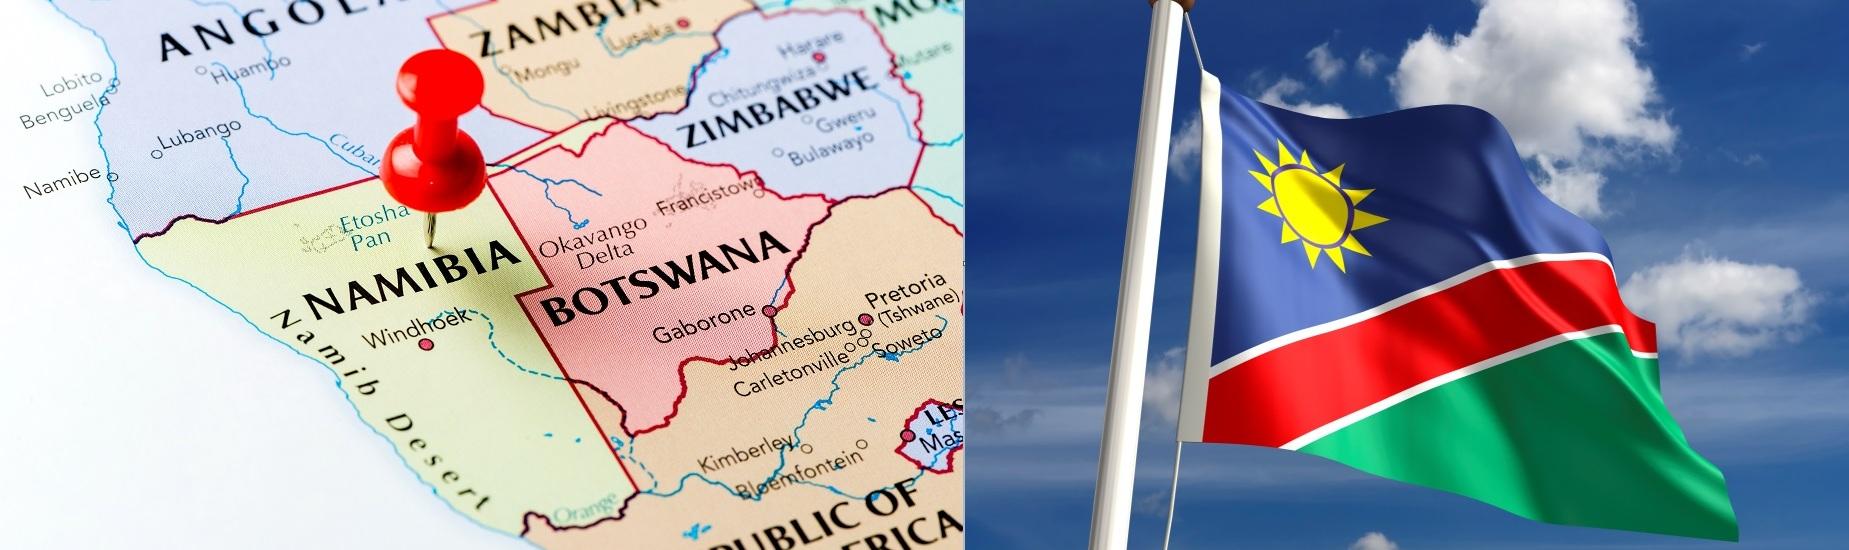 border-management-namibia.jpg